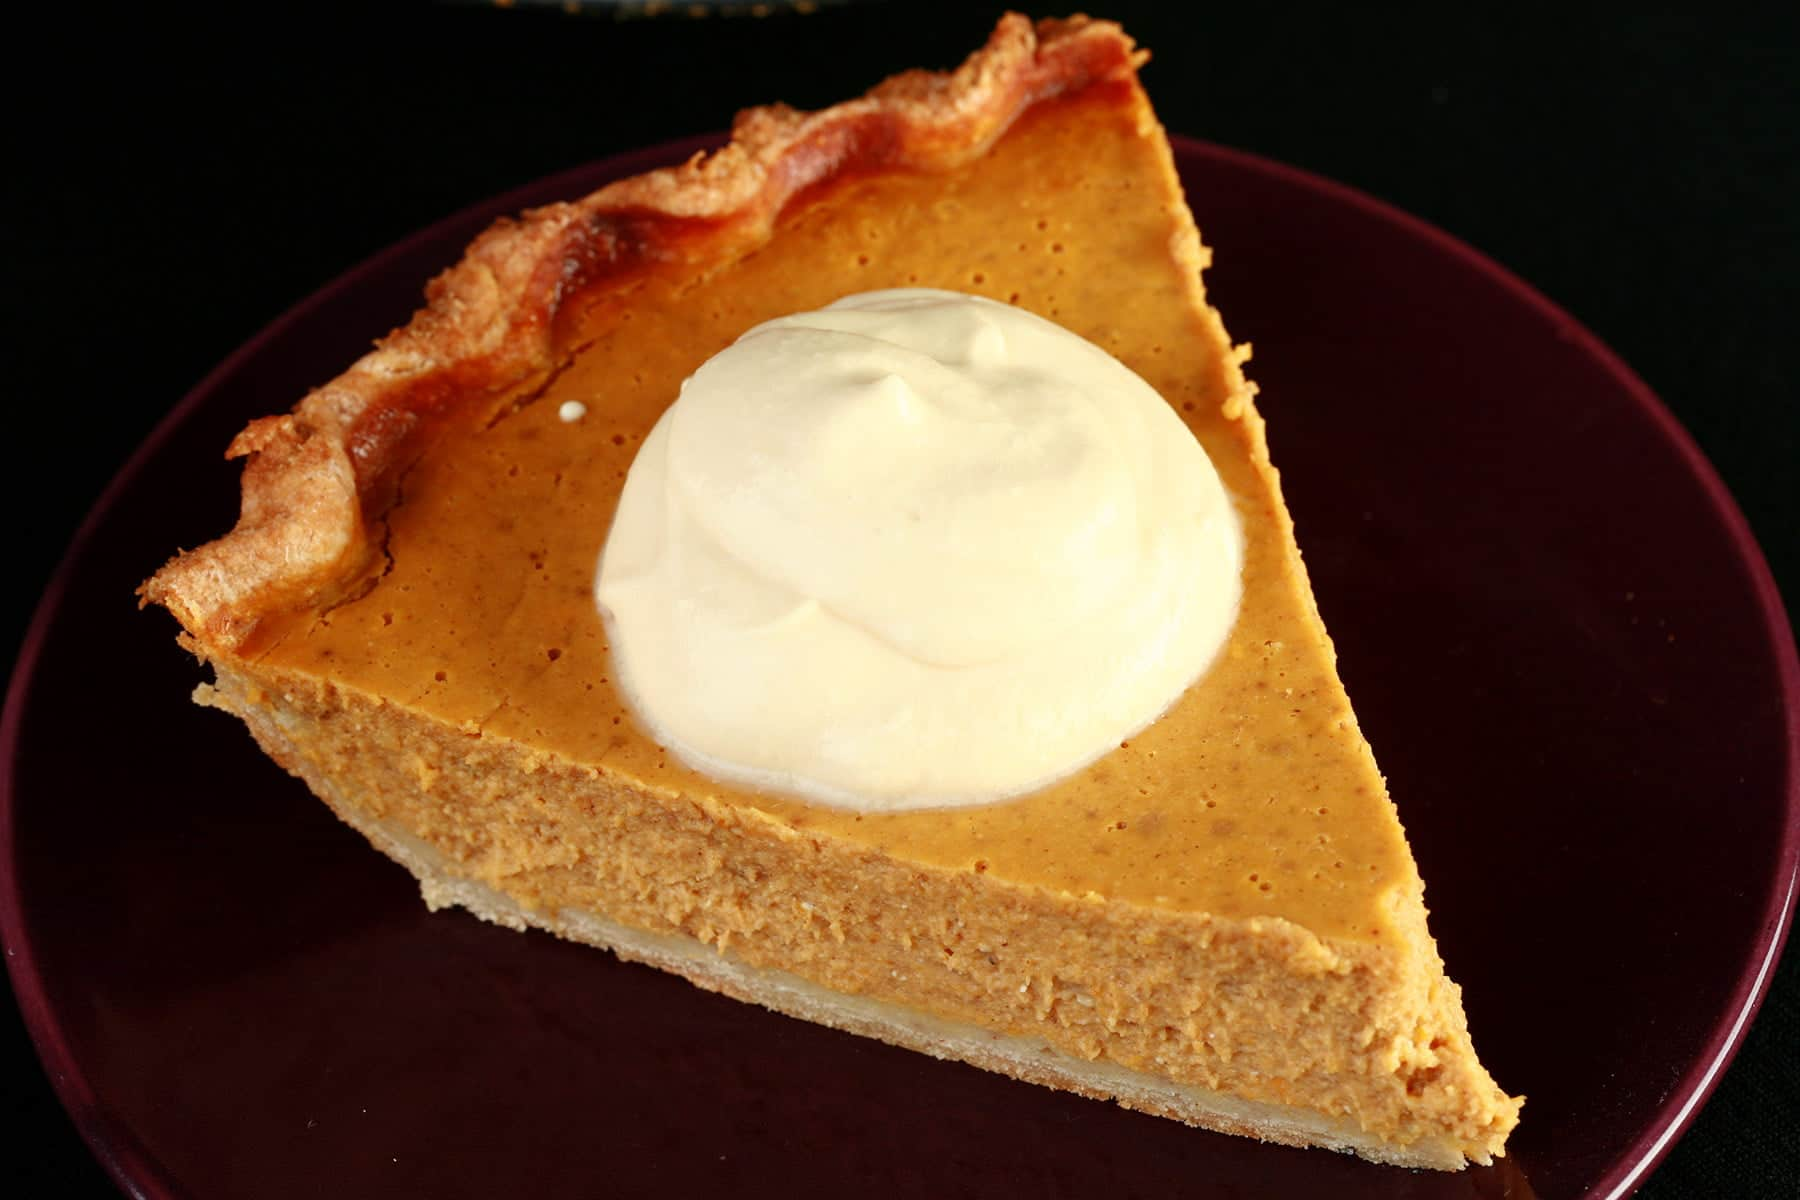 A slice of pumpkin pie with maple cream.